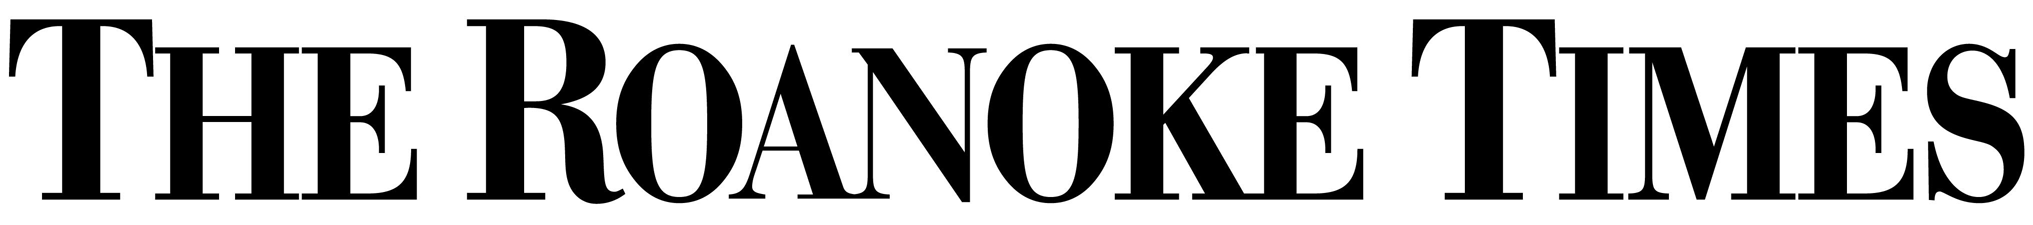 Roanoke Times logo.png